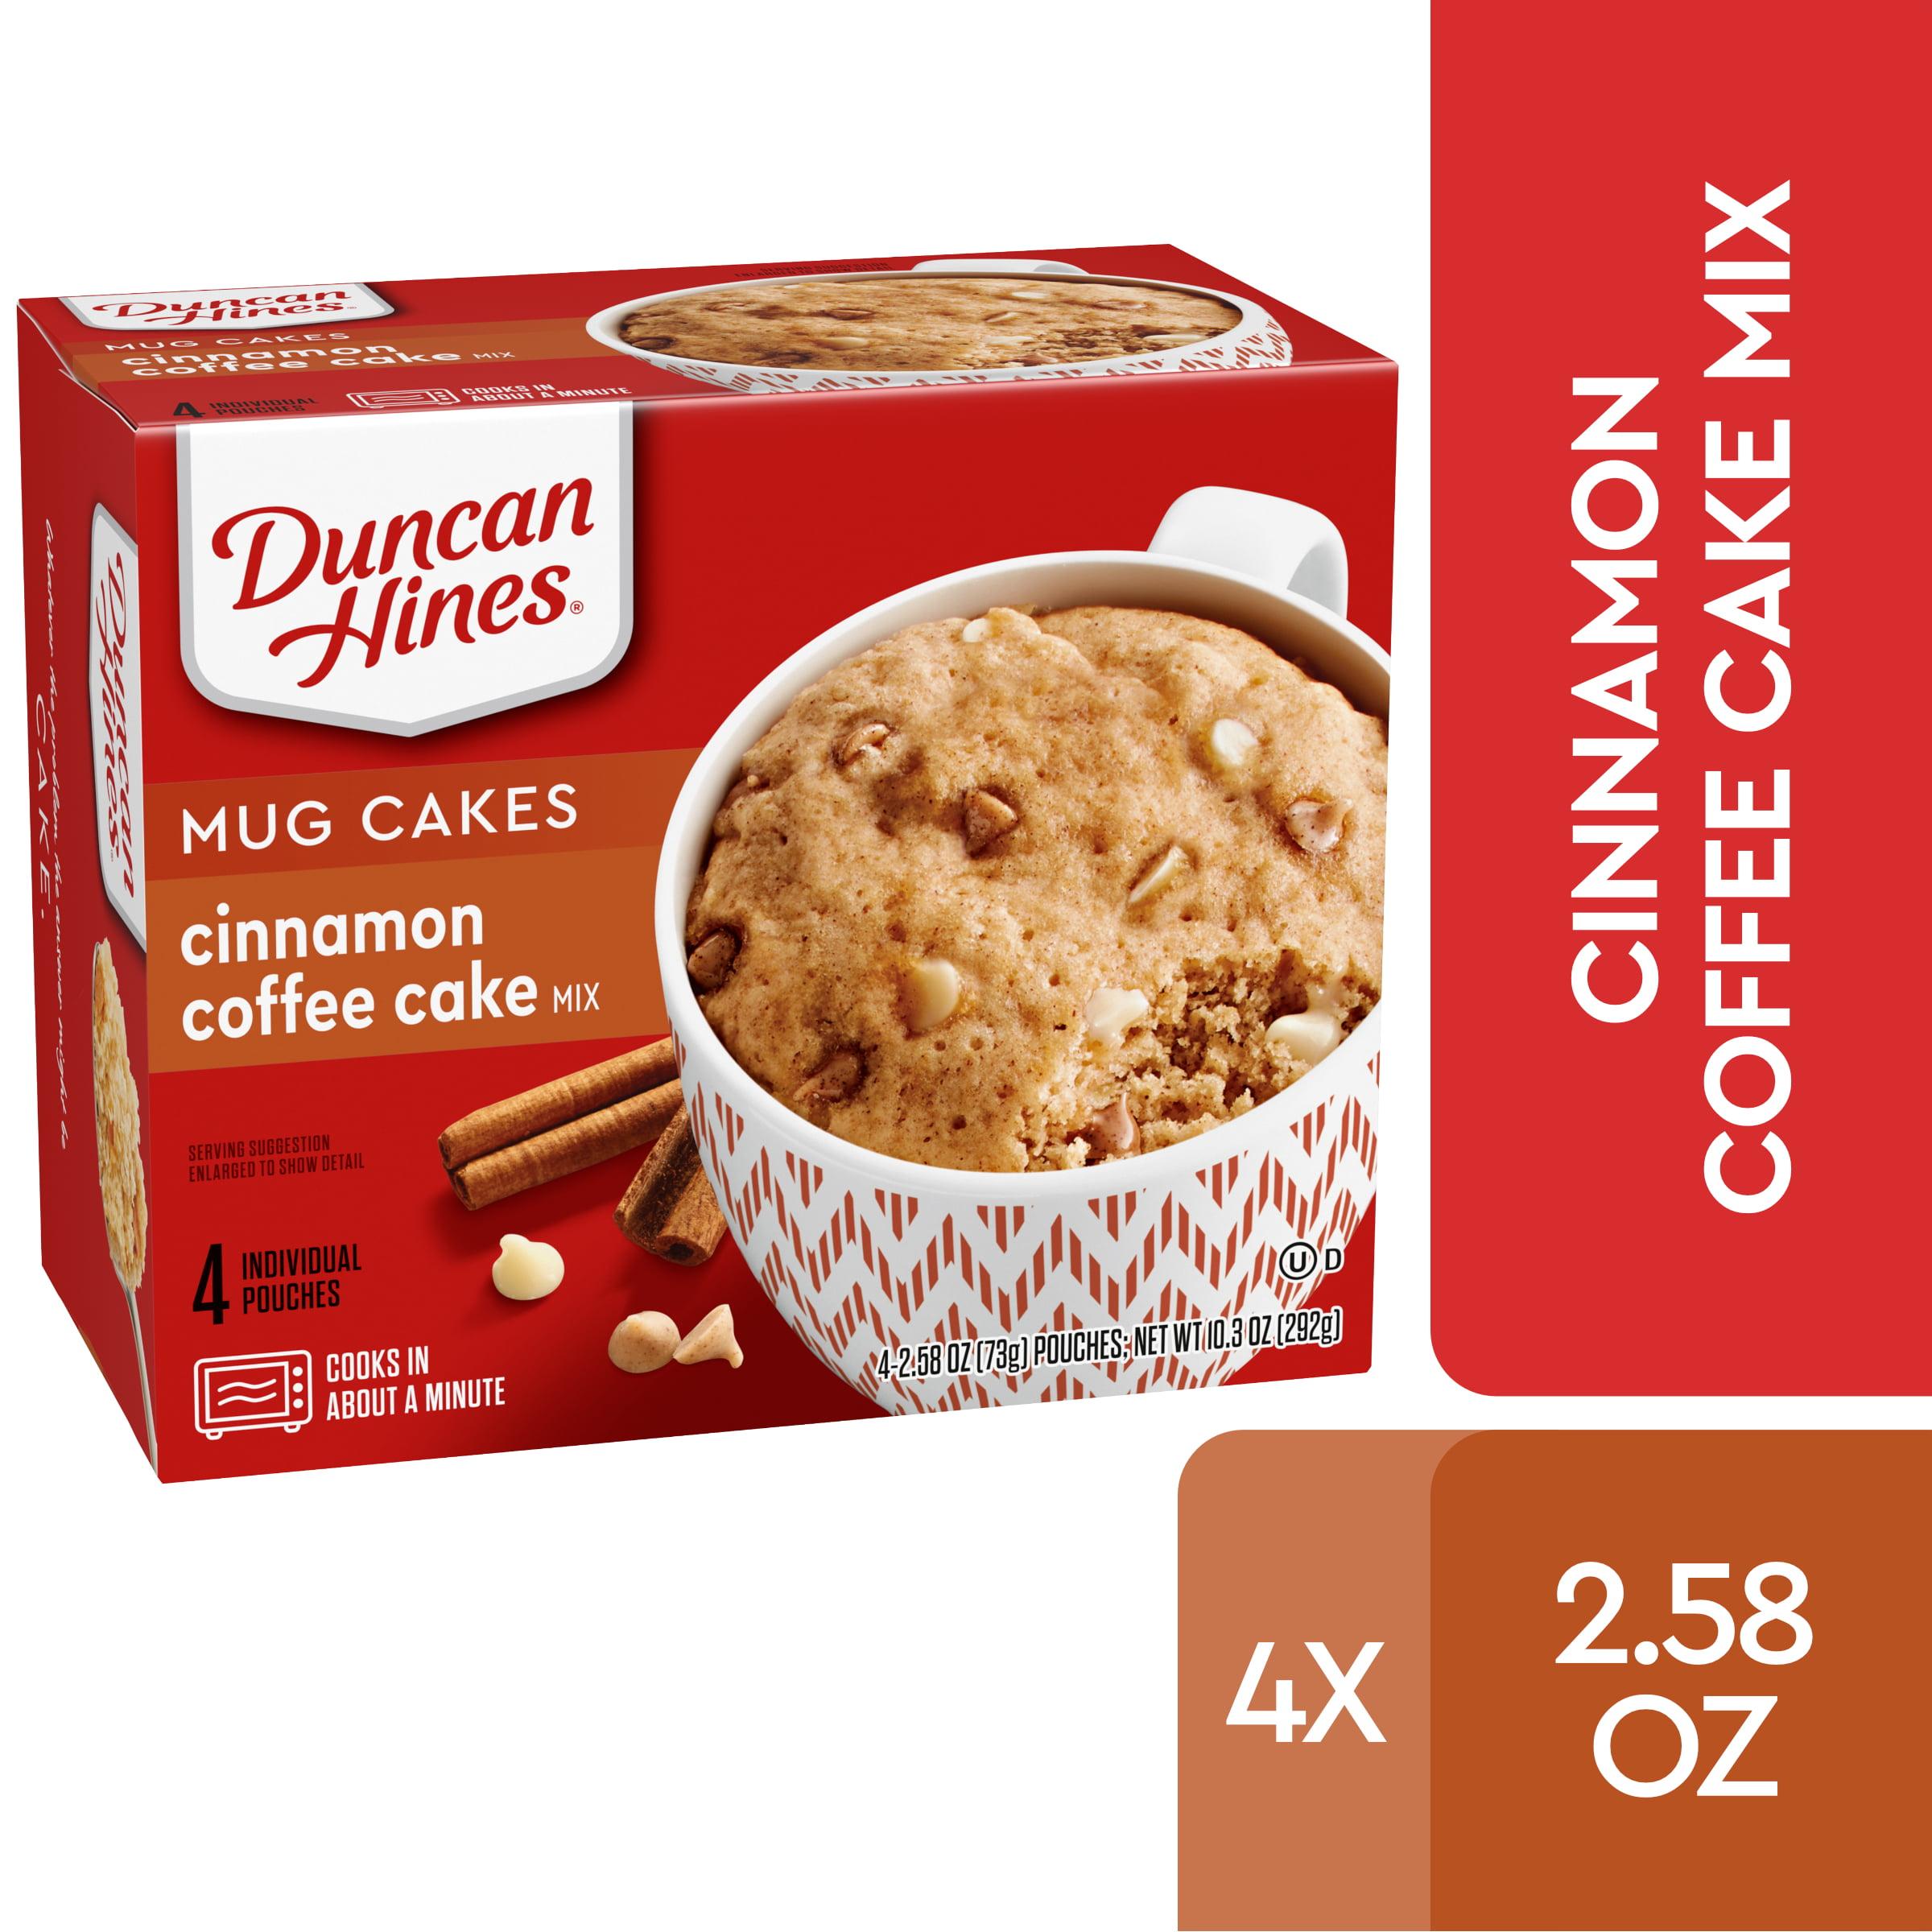 Duncan Hines Mug Cakes Cinnamon Coffee Cake Mix 4 - 2.58 OZ Pouches